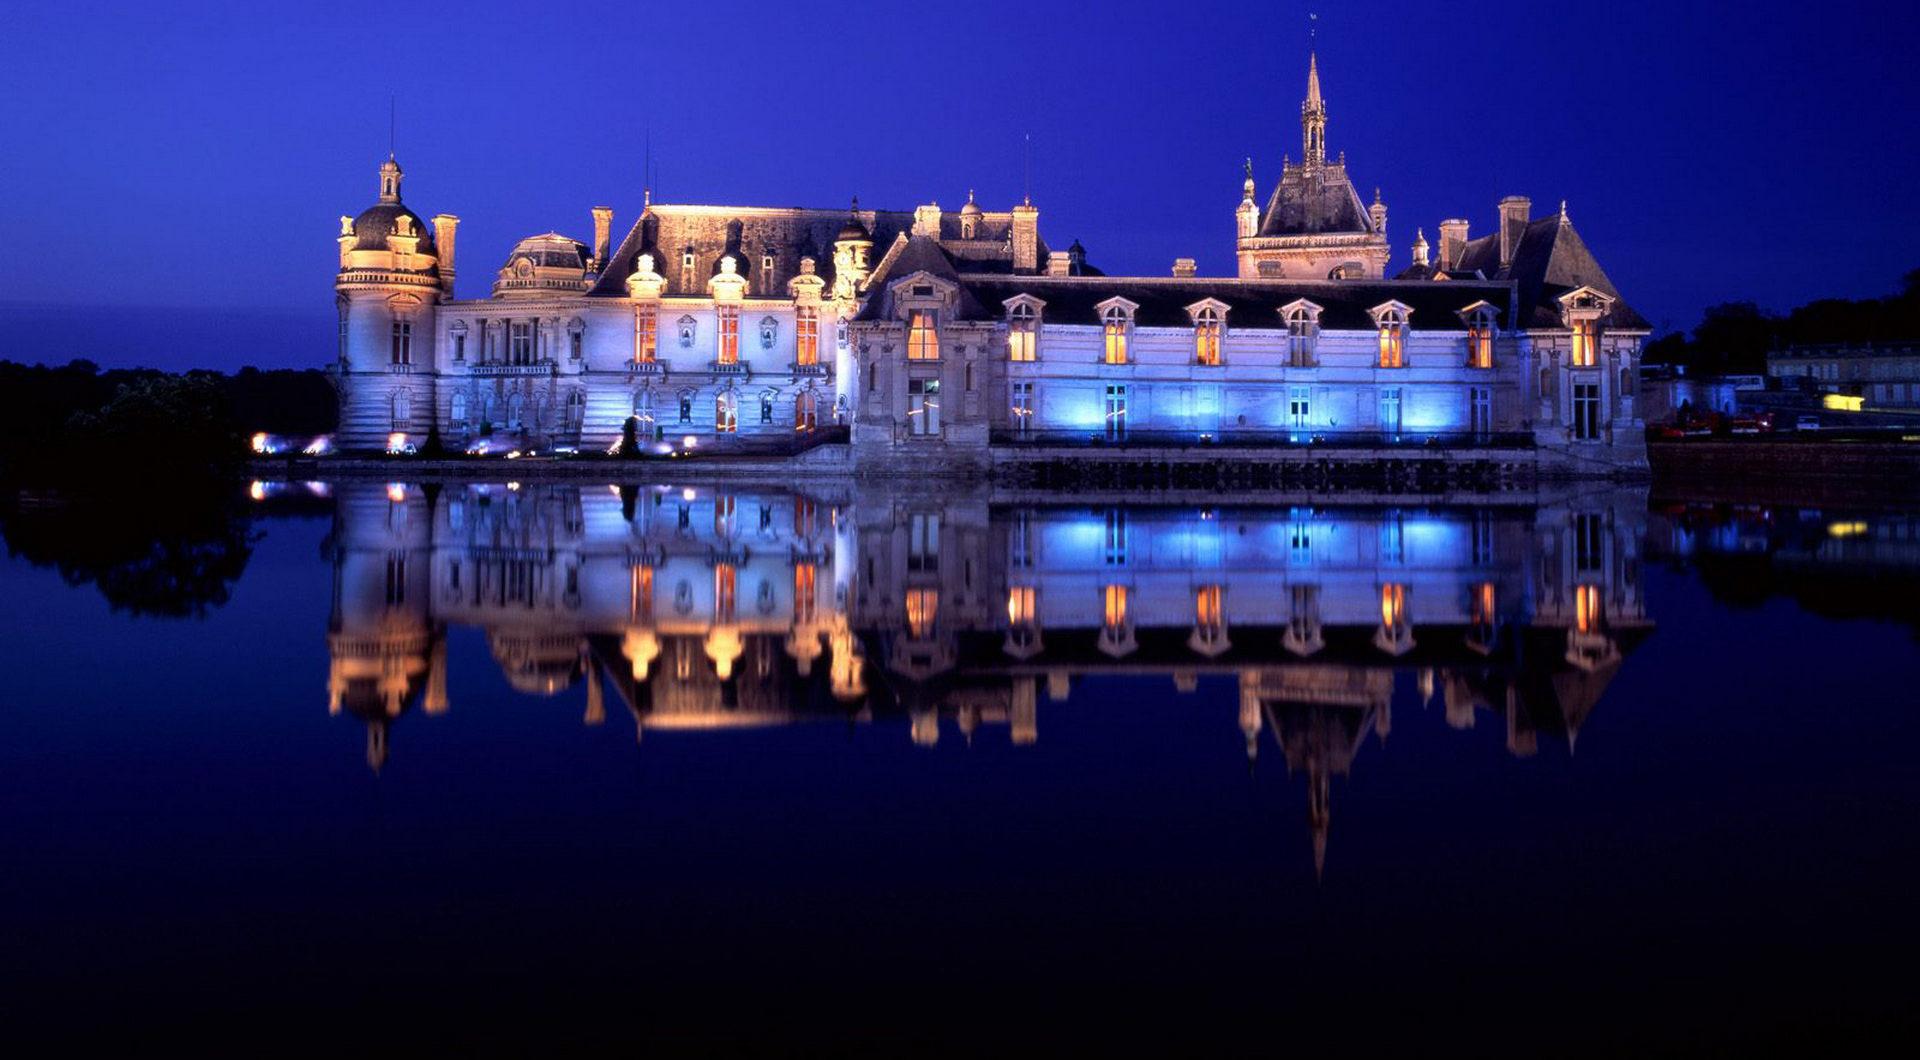 Chantilly e1579476053824 - CHATEAU DE CHANTILLY